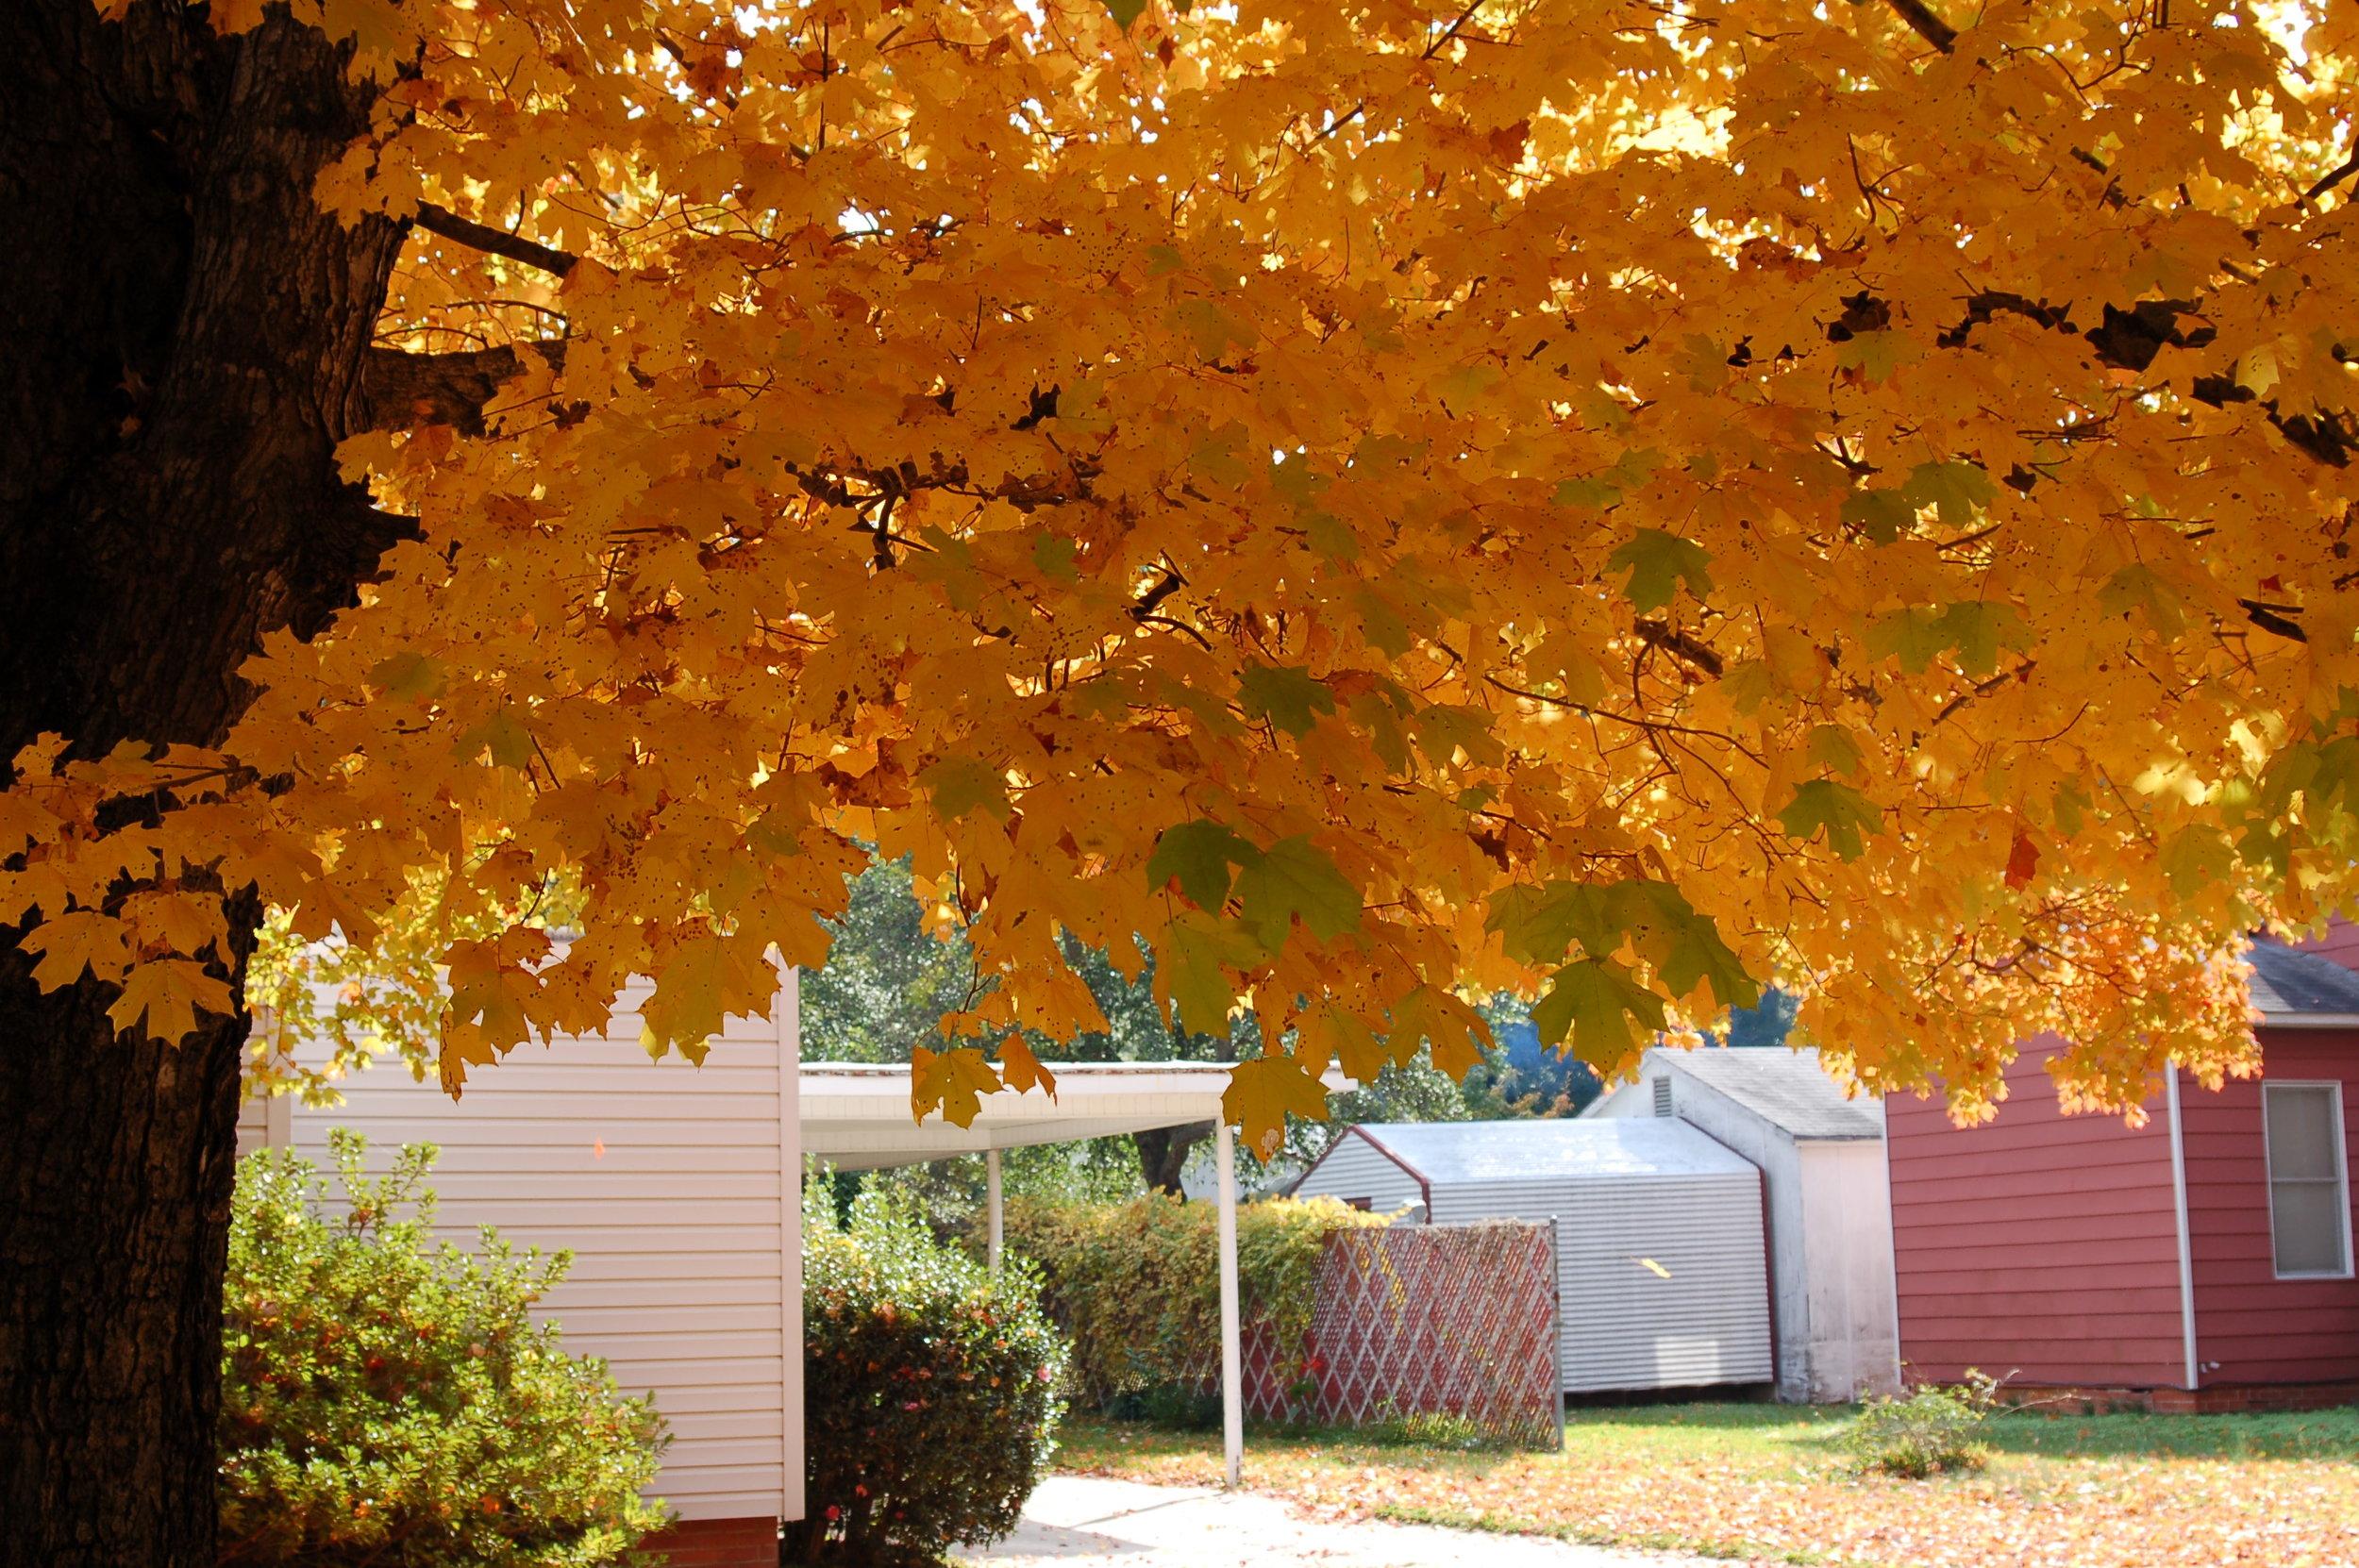 Harvest-Moon-Sugar-Maple-Acer-saccharum-fall-color-foliage-4.jpg